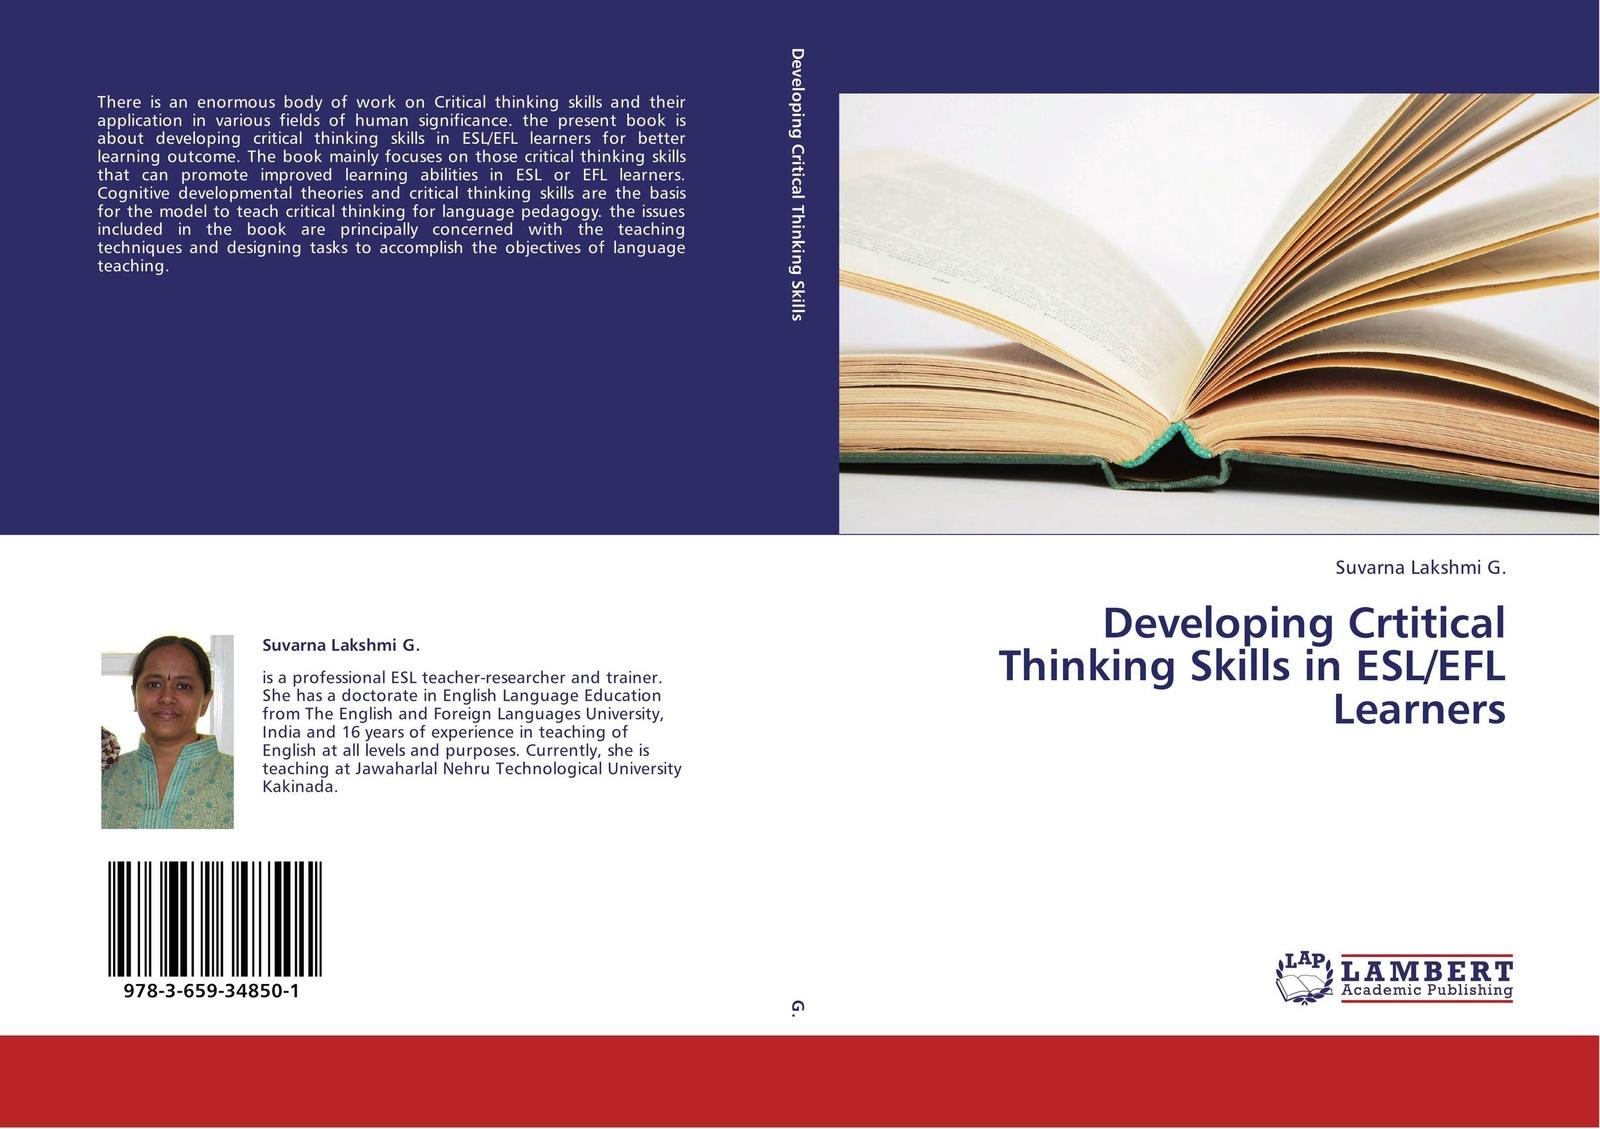 Suvarna Lakshmi G. Developing Crtitical Thinking Skills in ESL/EFL Learners цена